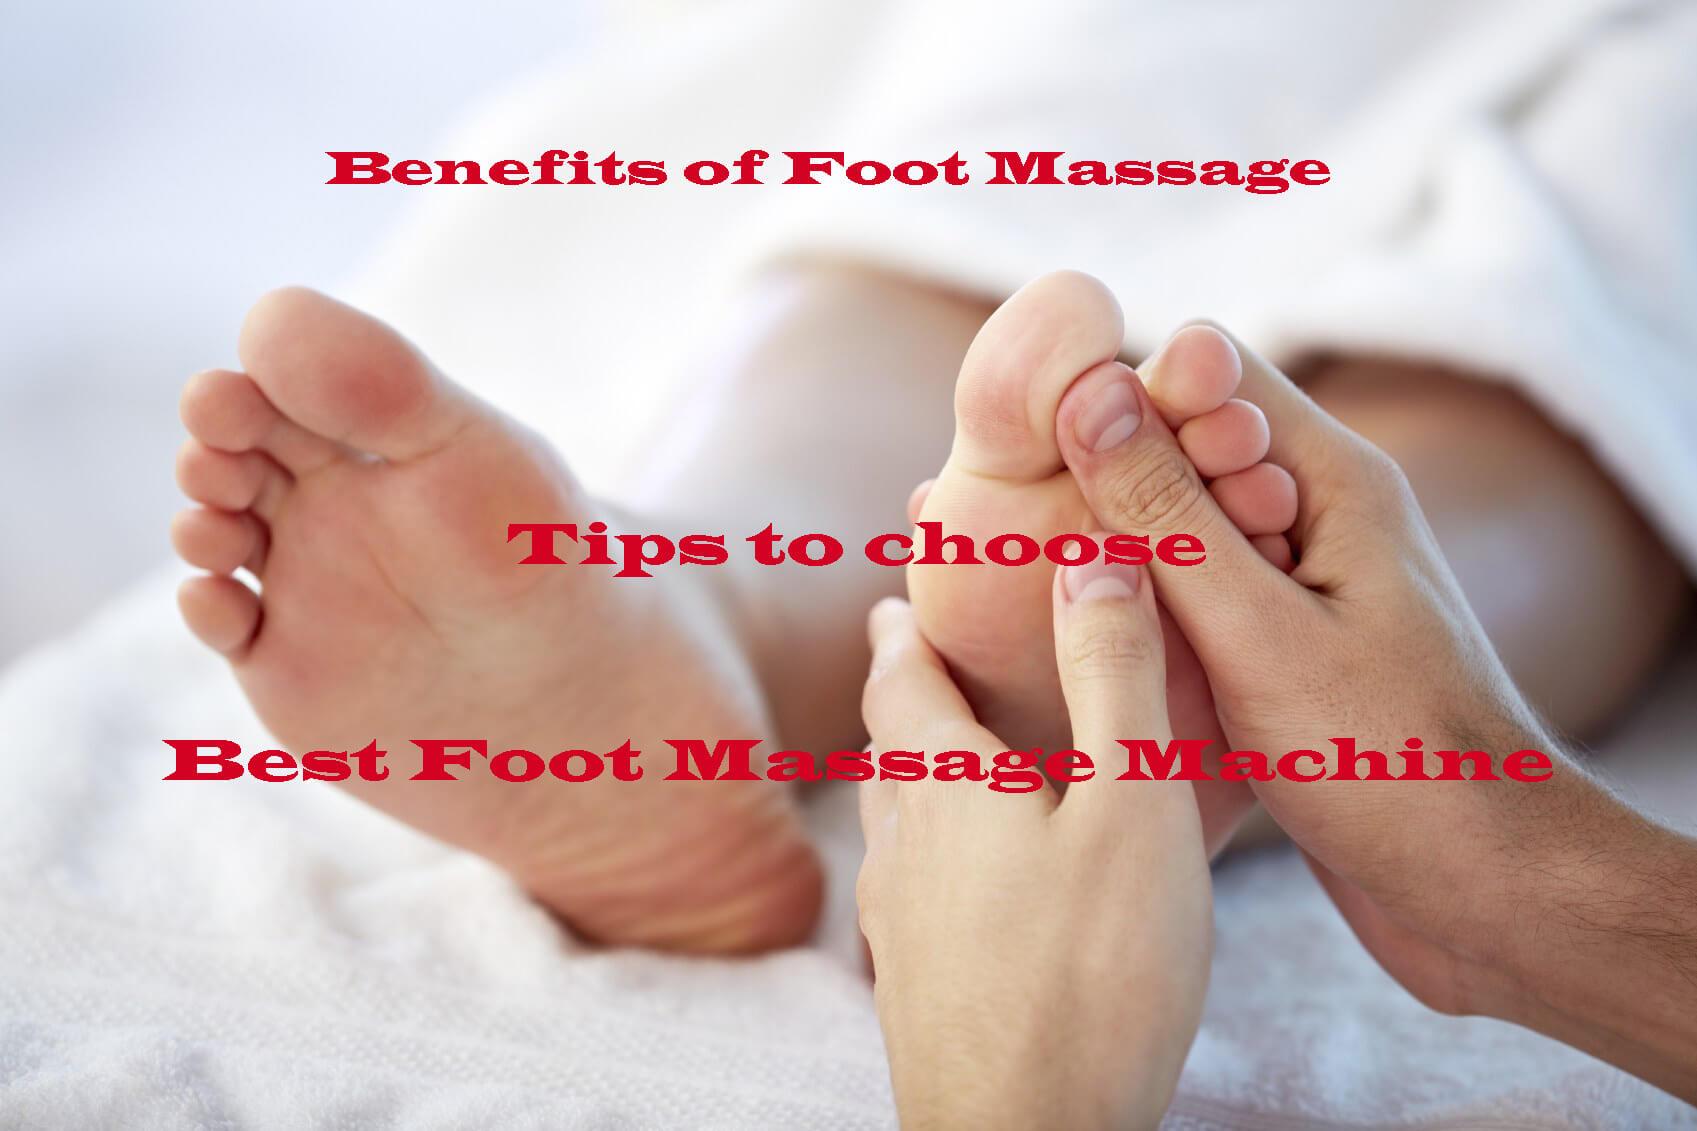 Tips to Choose Best Foot Massage Machine 2017